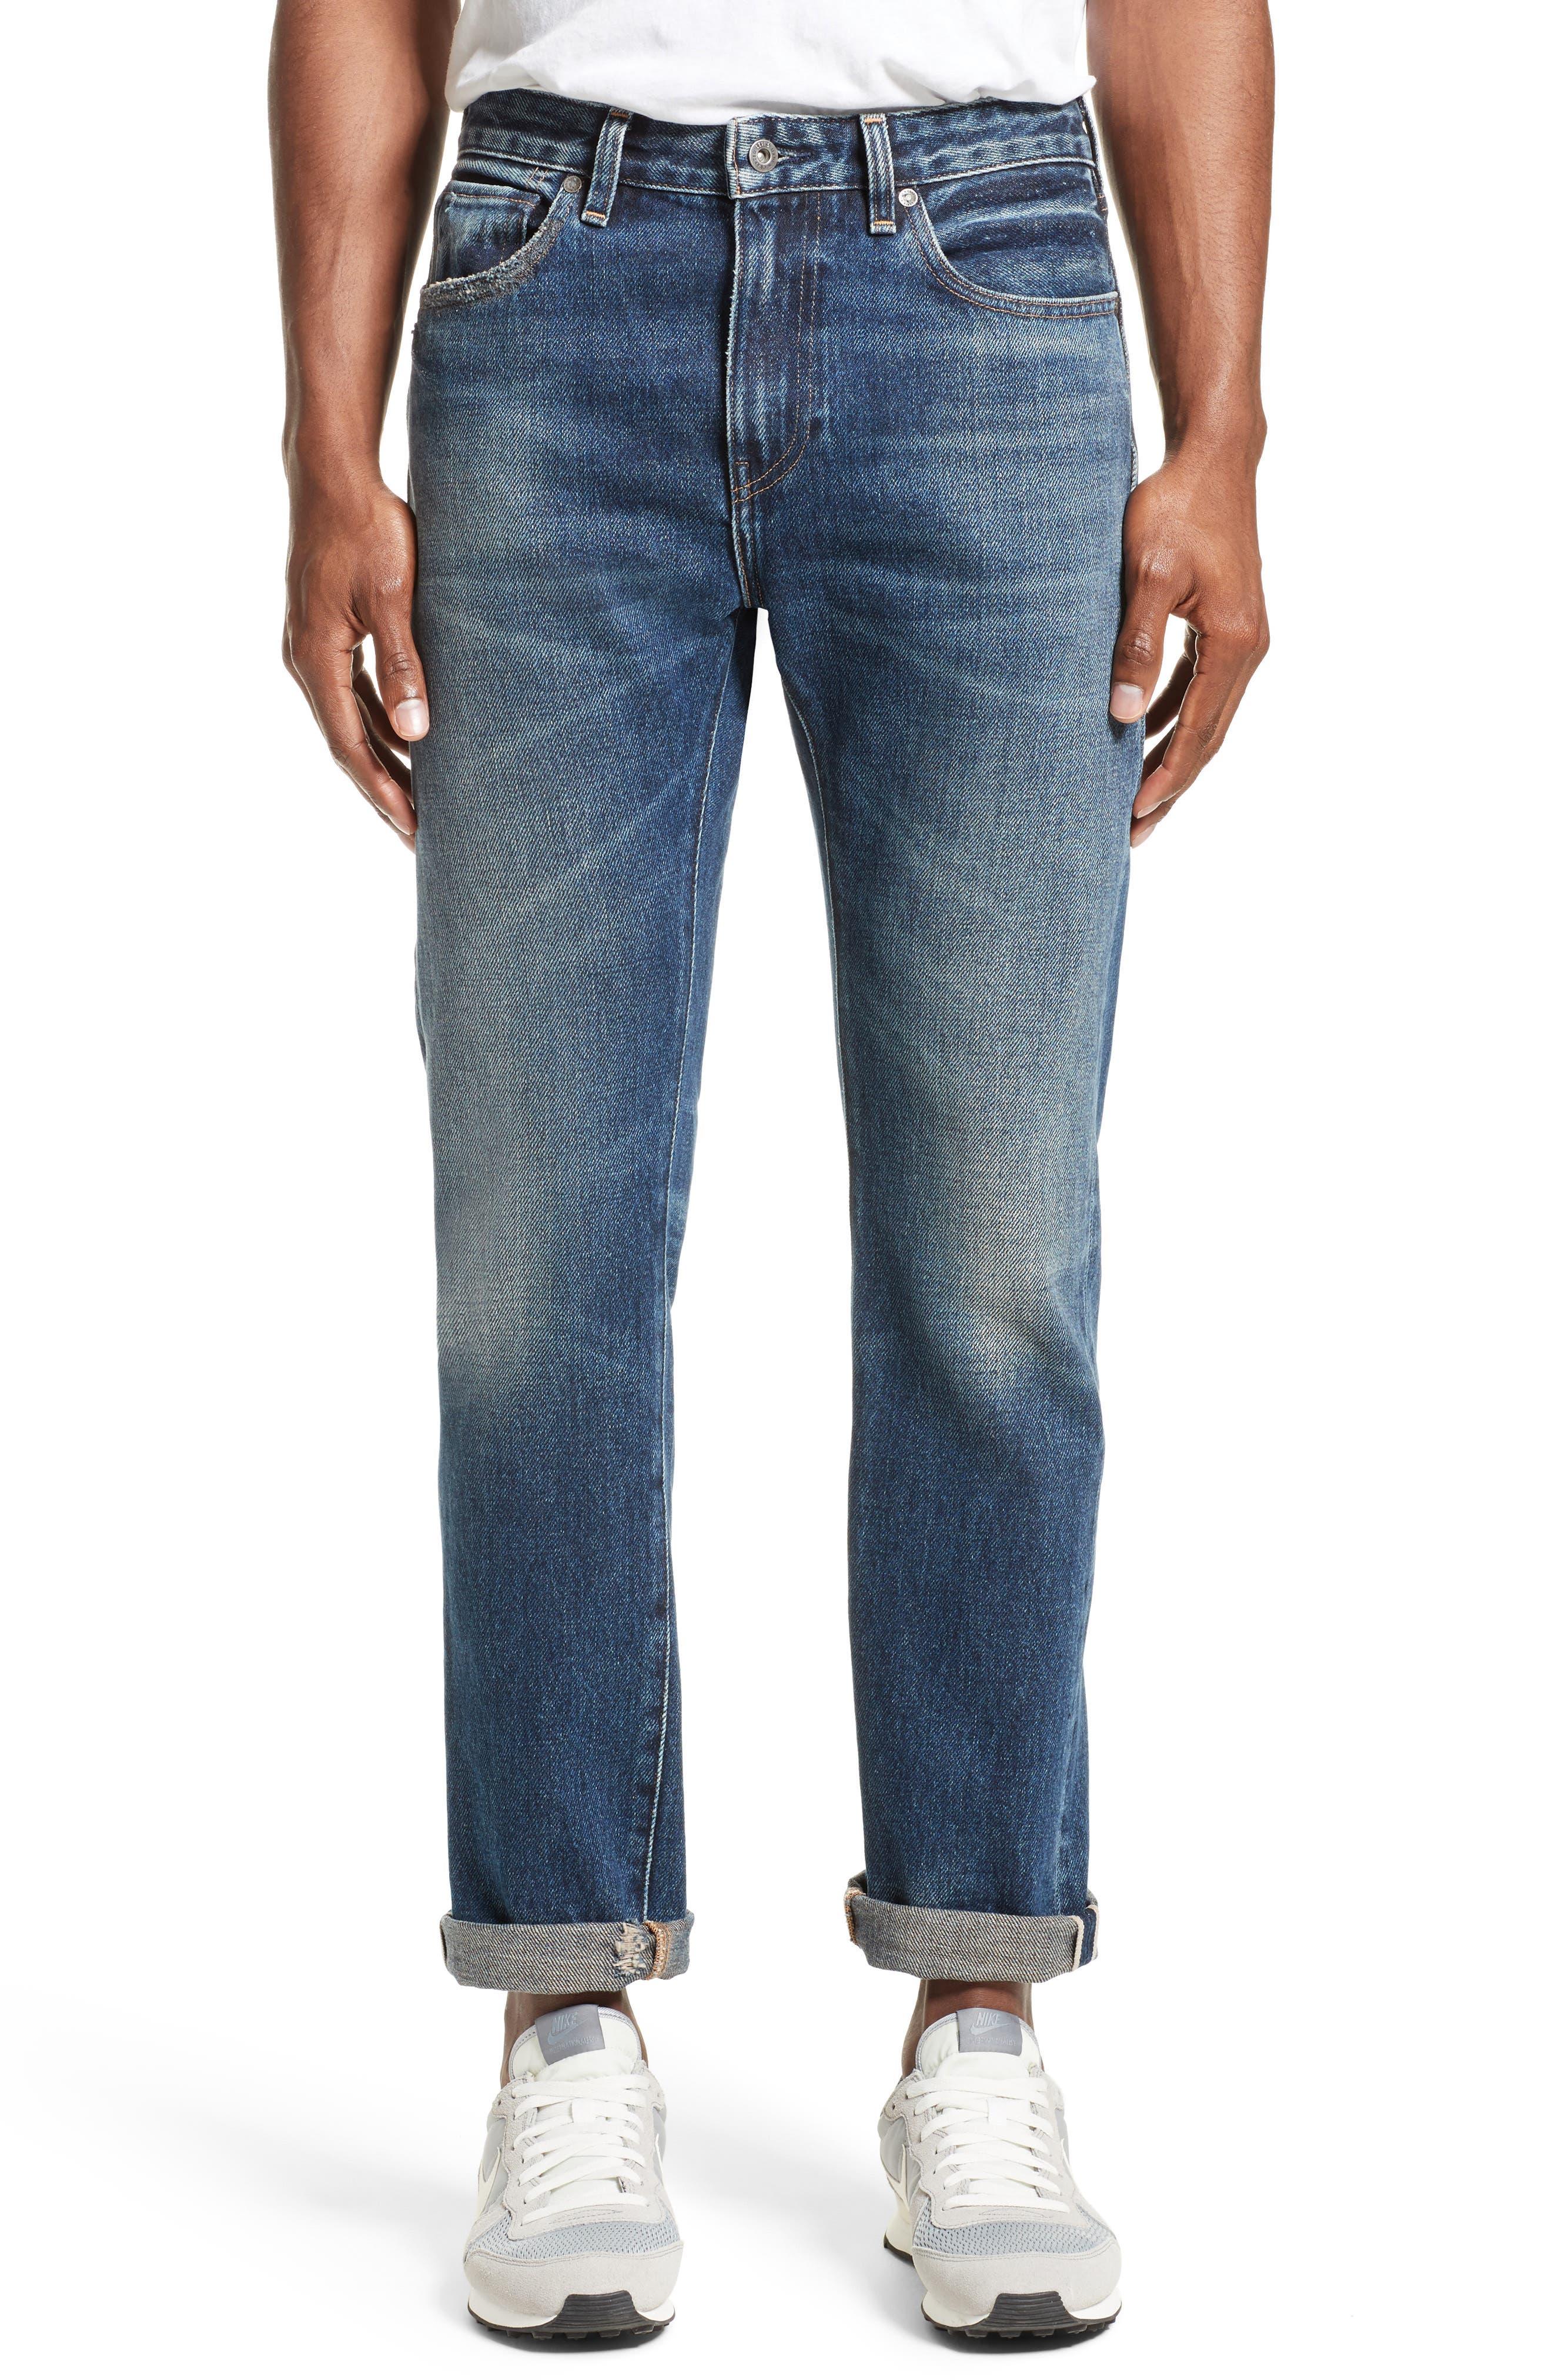 Tack Slim Fit Jeans,                         Main,                         color, 420